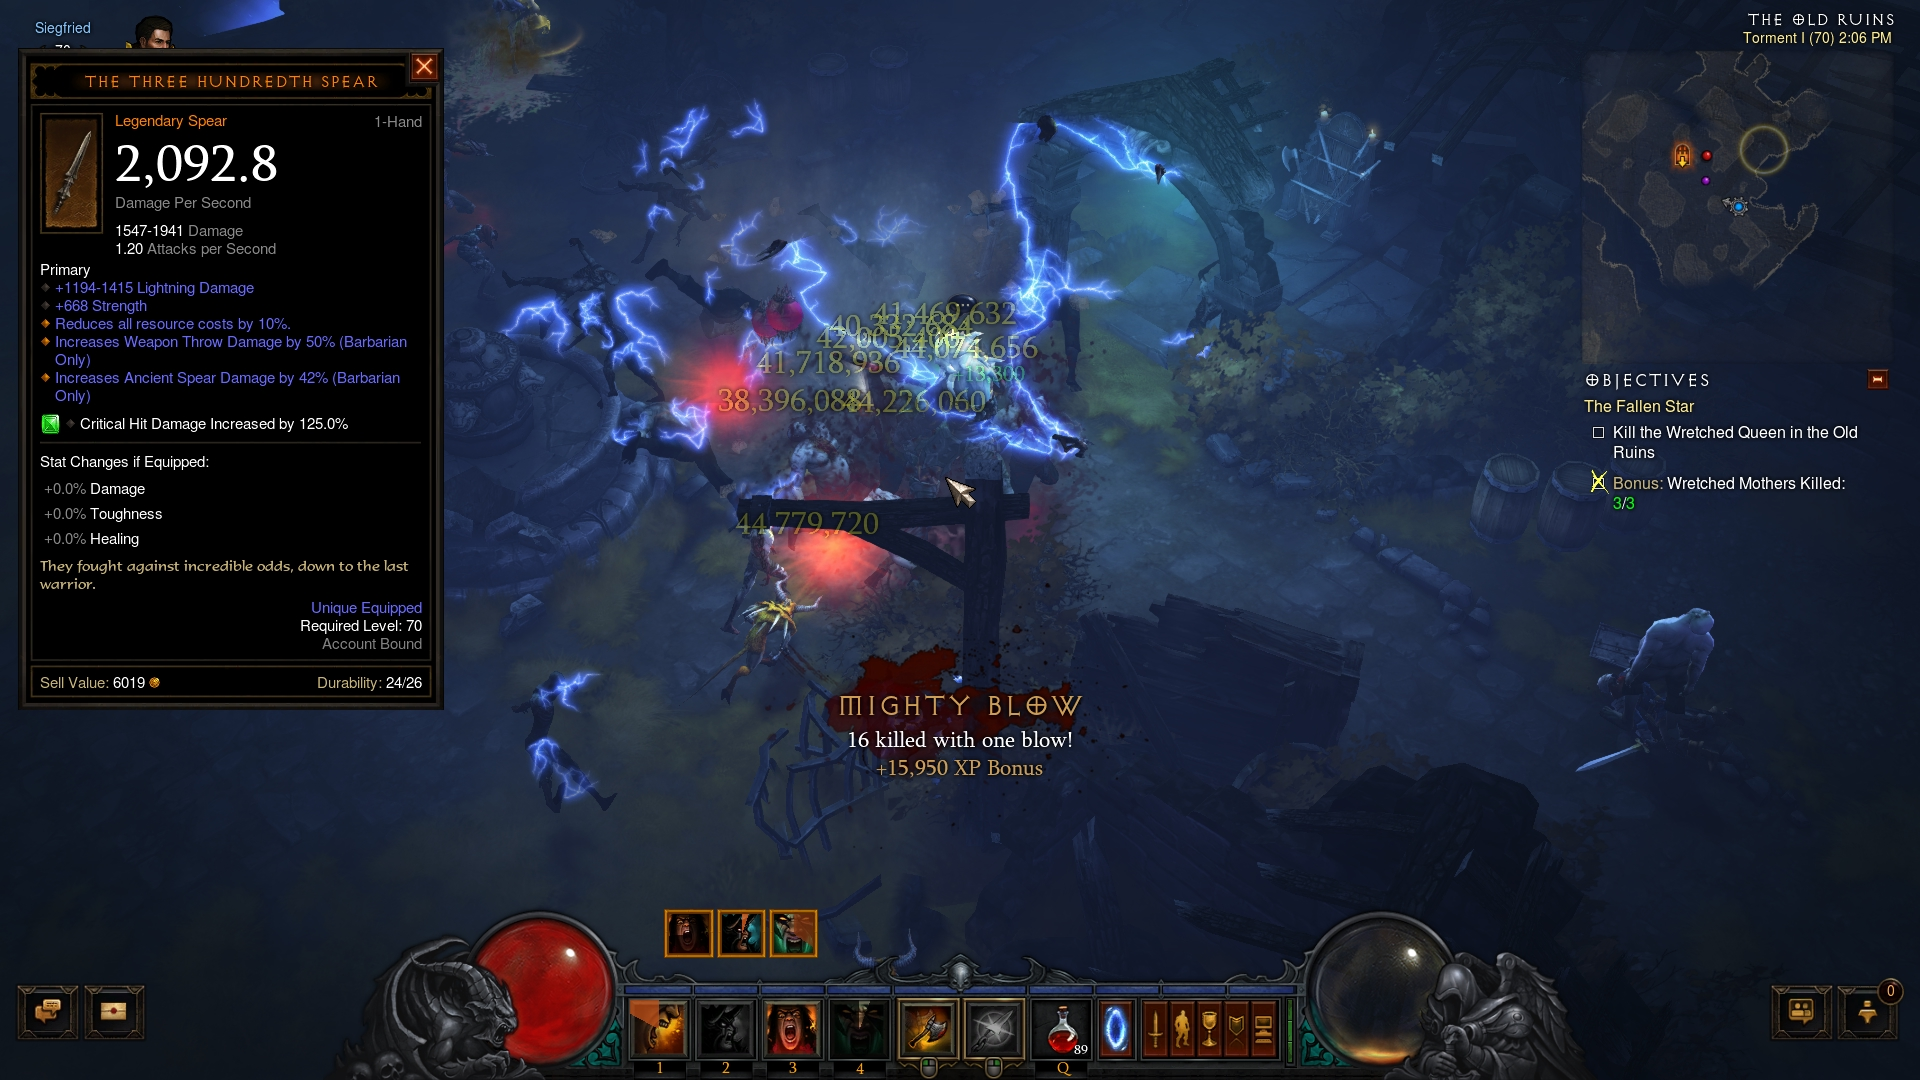 dowzer games that confirmation brevik joining team seen reaper souls hadnt diablo